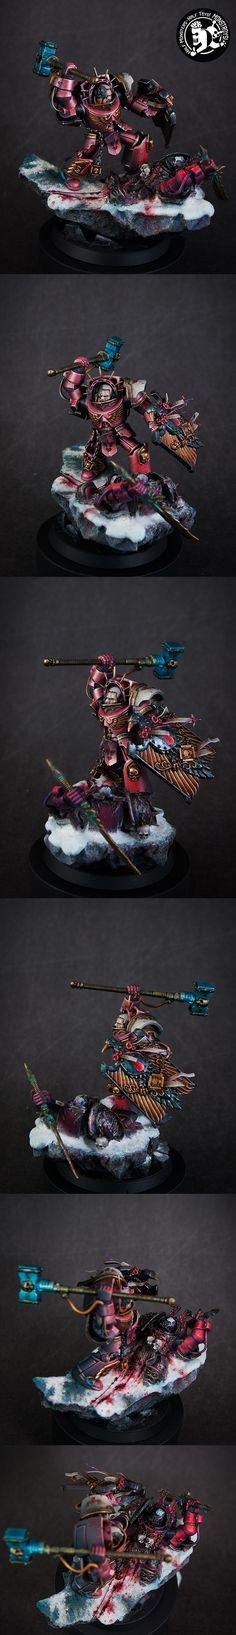 Gabriel Angelos, Blood Ravens chapter master in Terminator armor - Monstroys